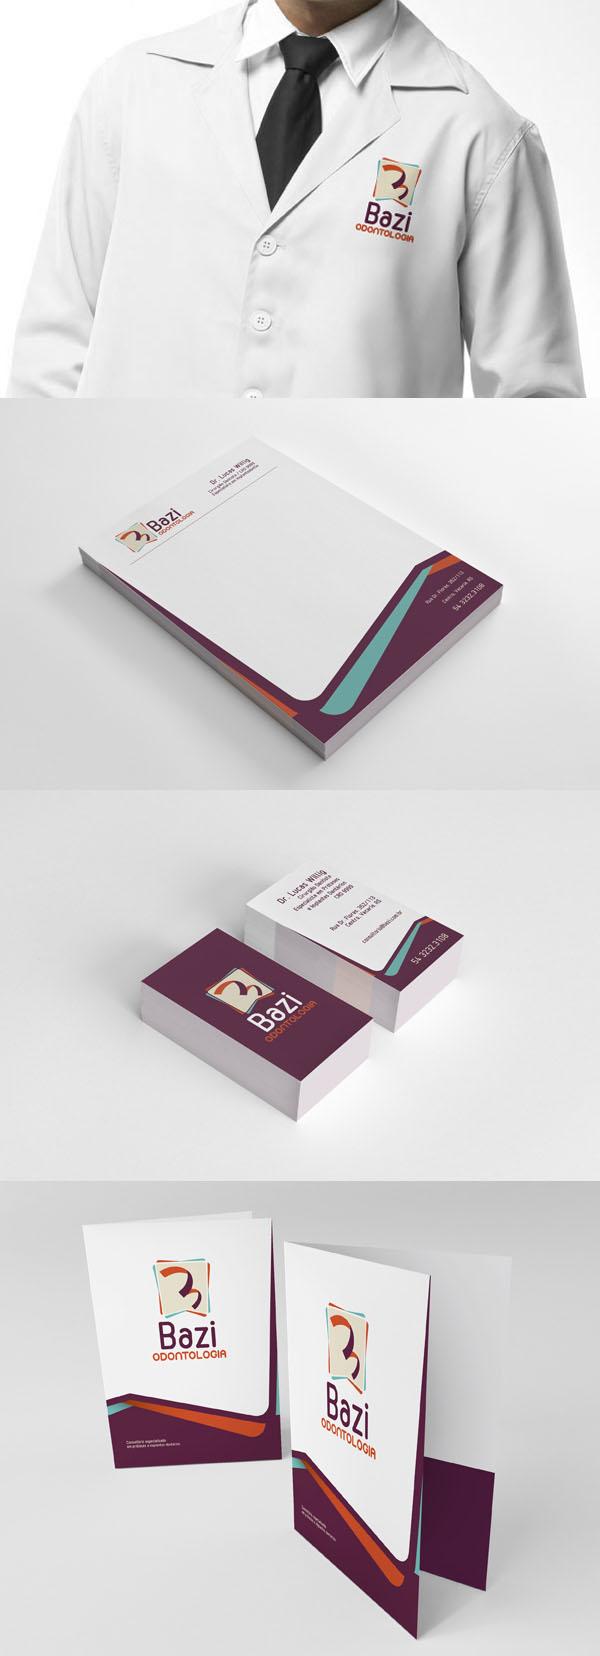 34-bazi-odontologia-branding-design